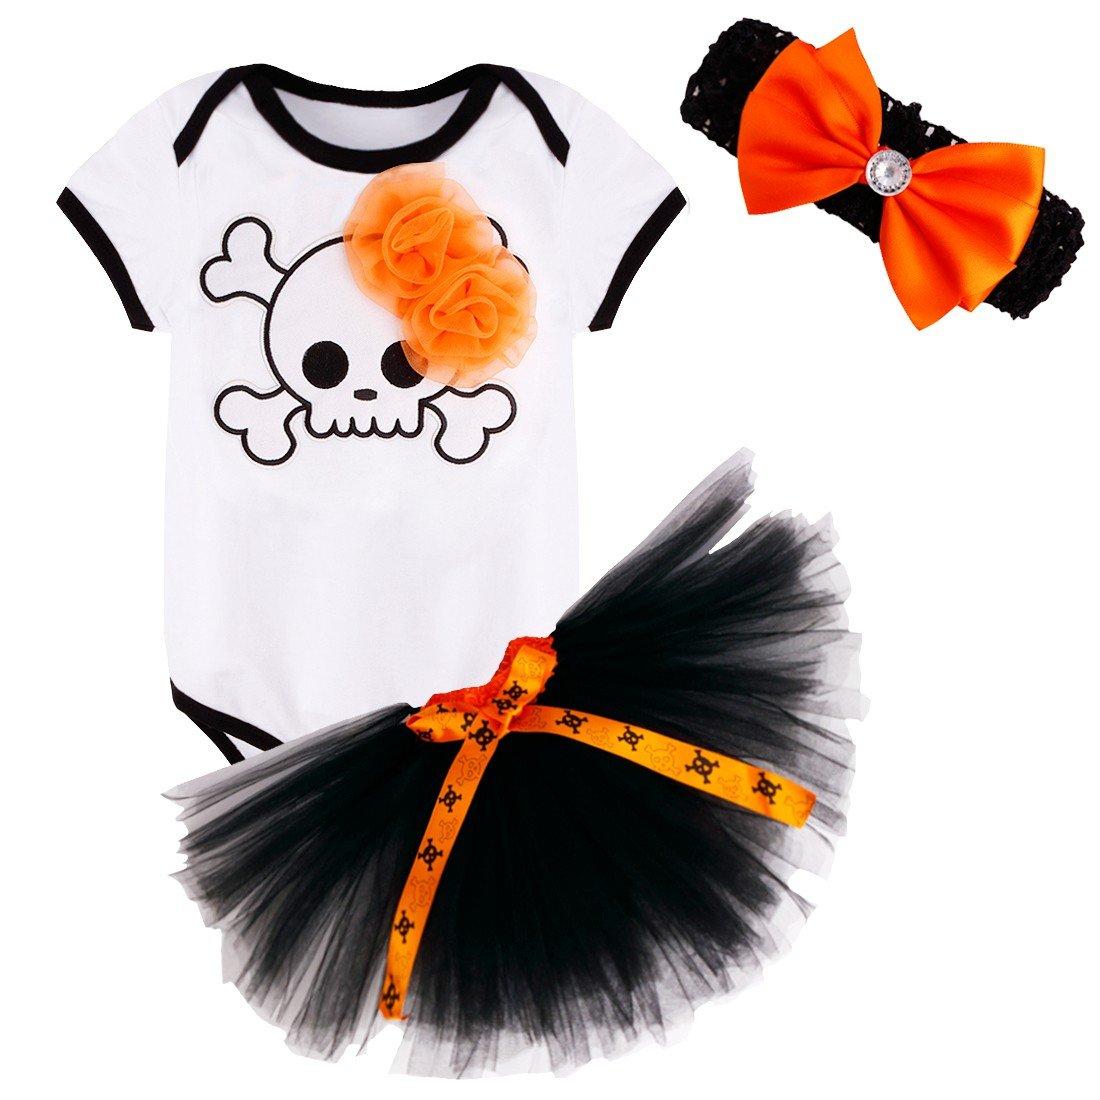 Freebily 3PCS Infant Baby Girls 1st Halloween Costumes Short Sleeves Romper + Tutu Skirt + Headband Outfits